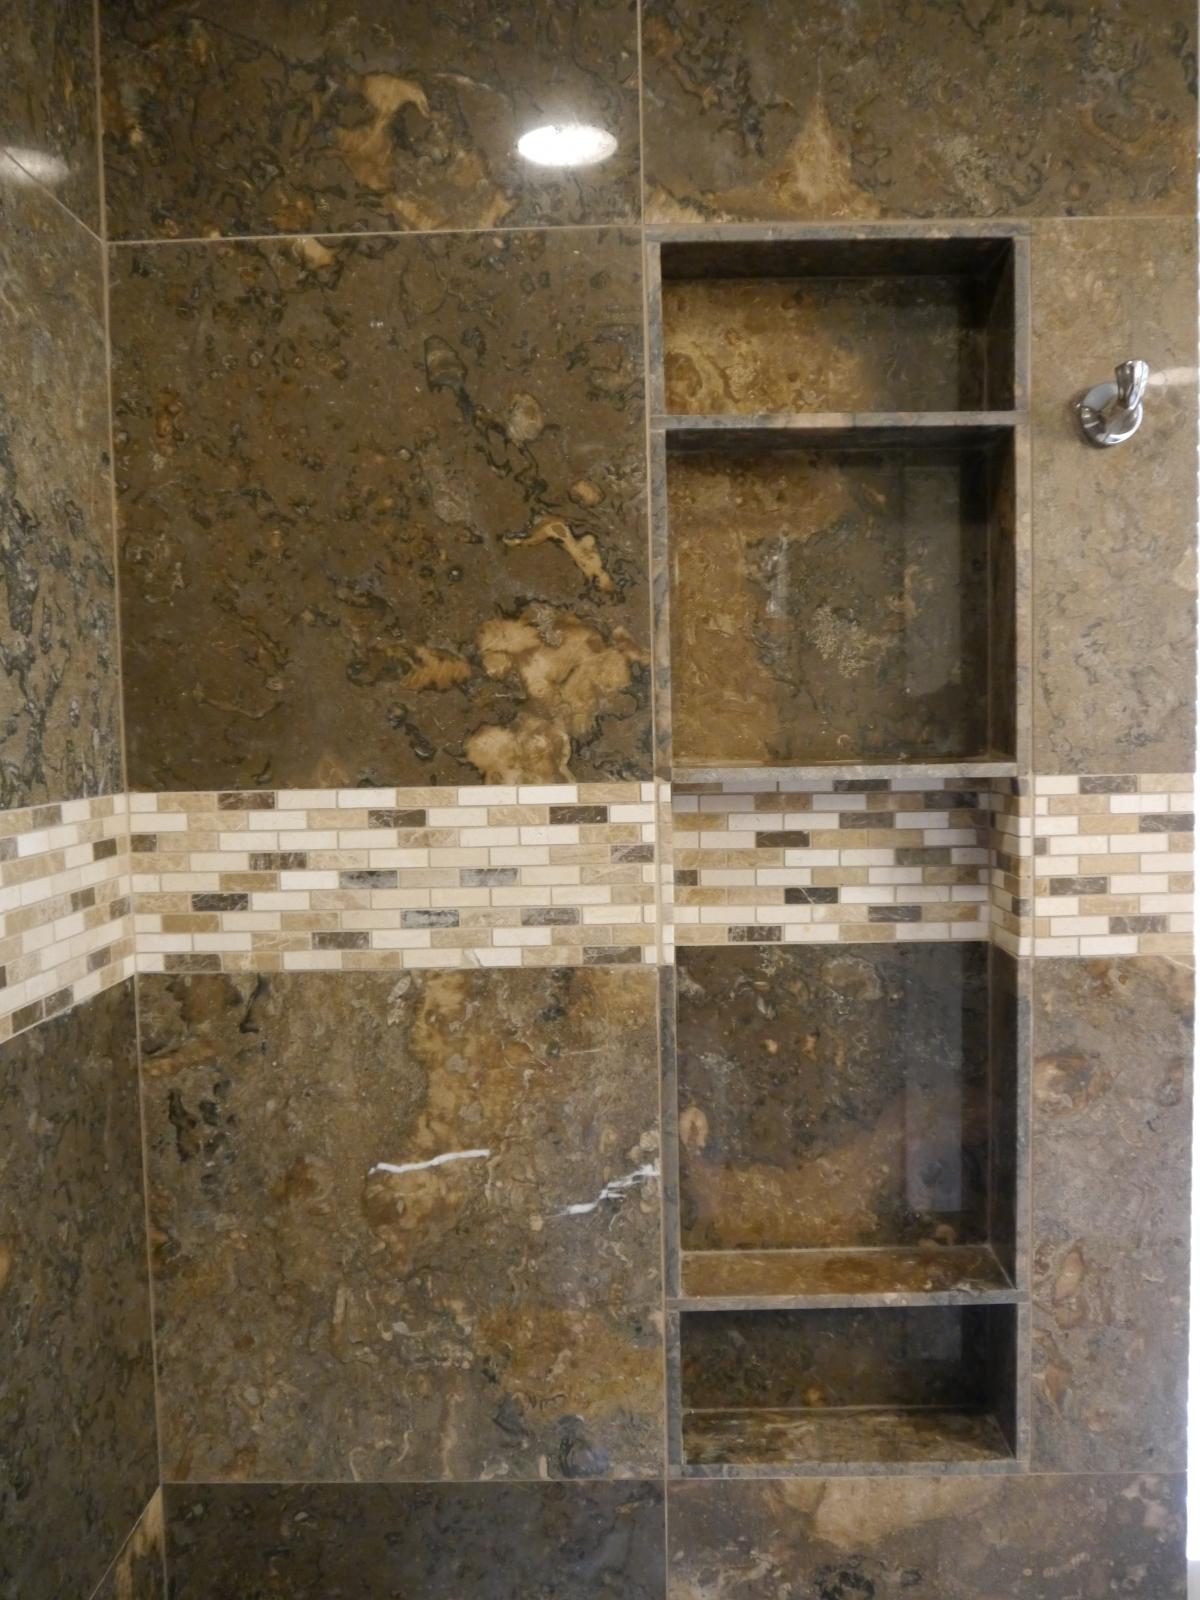 kitchen and bath remodel desk chair shower & tub niches